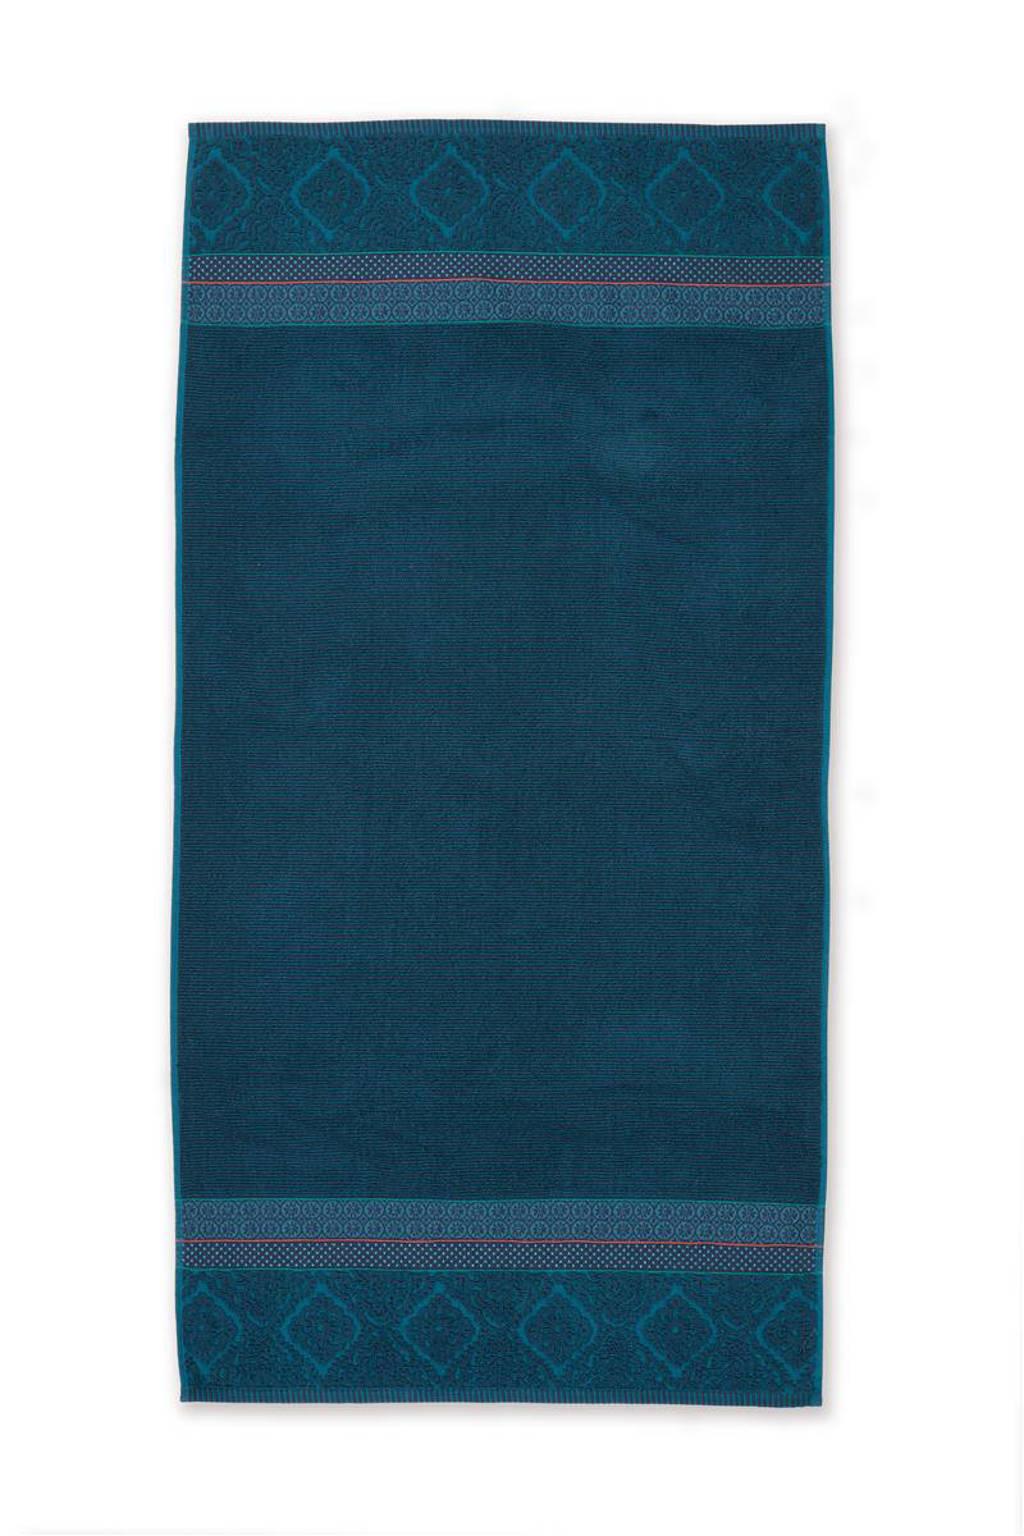 Pip Studio badlaken Soft Zellige (140x70 cm), Donkerblauw